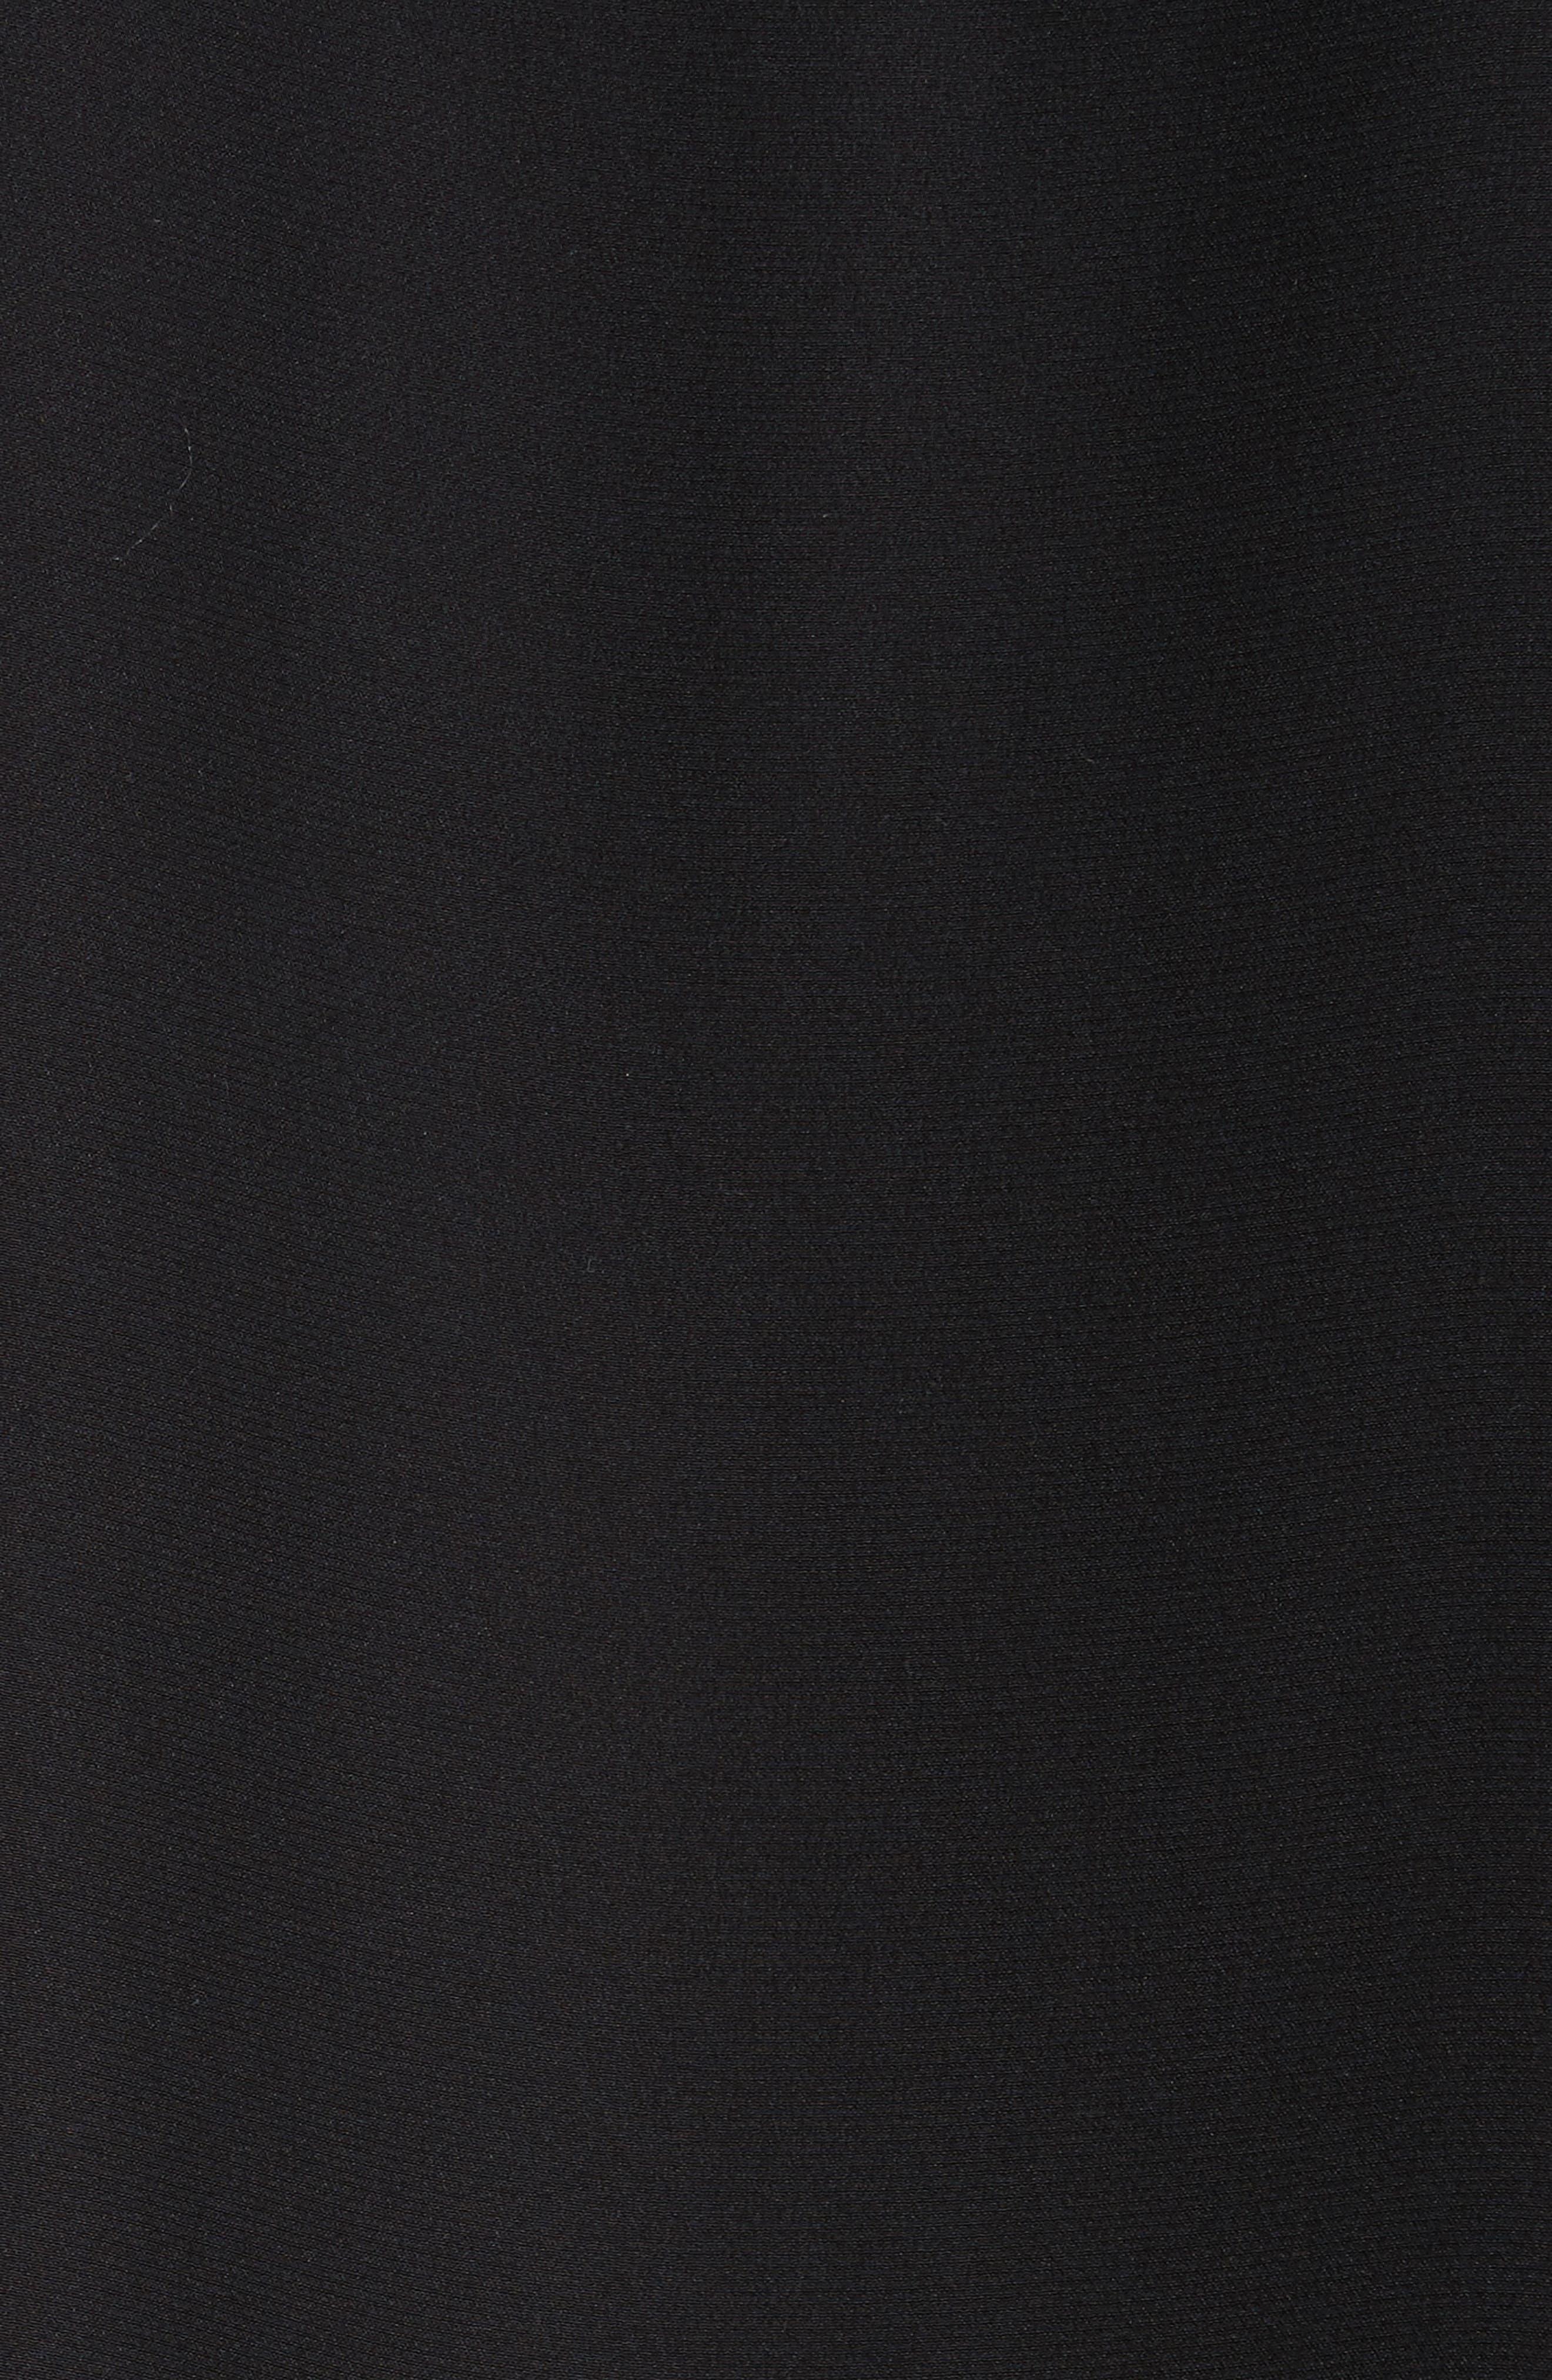 Rib Trim Silk Top,                             Alternate thumbnail 5, color,                             Black